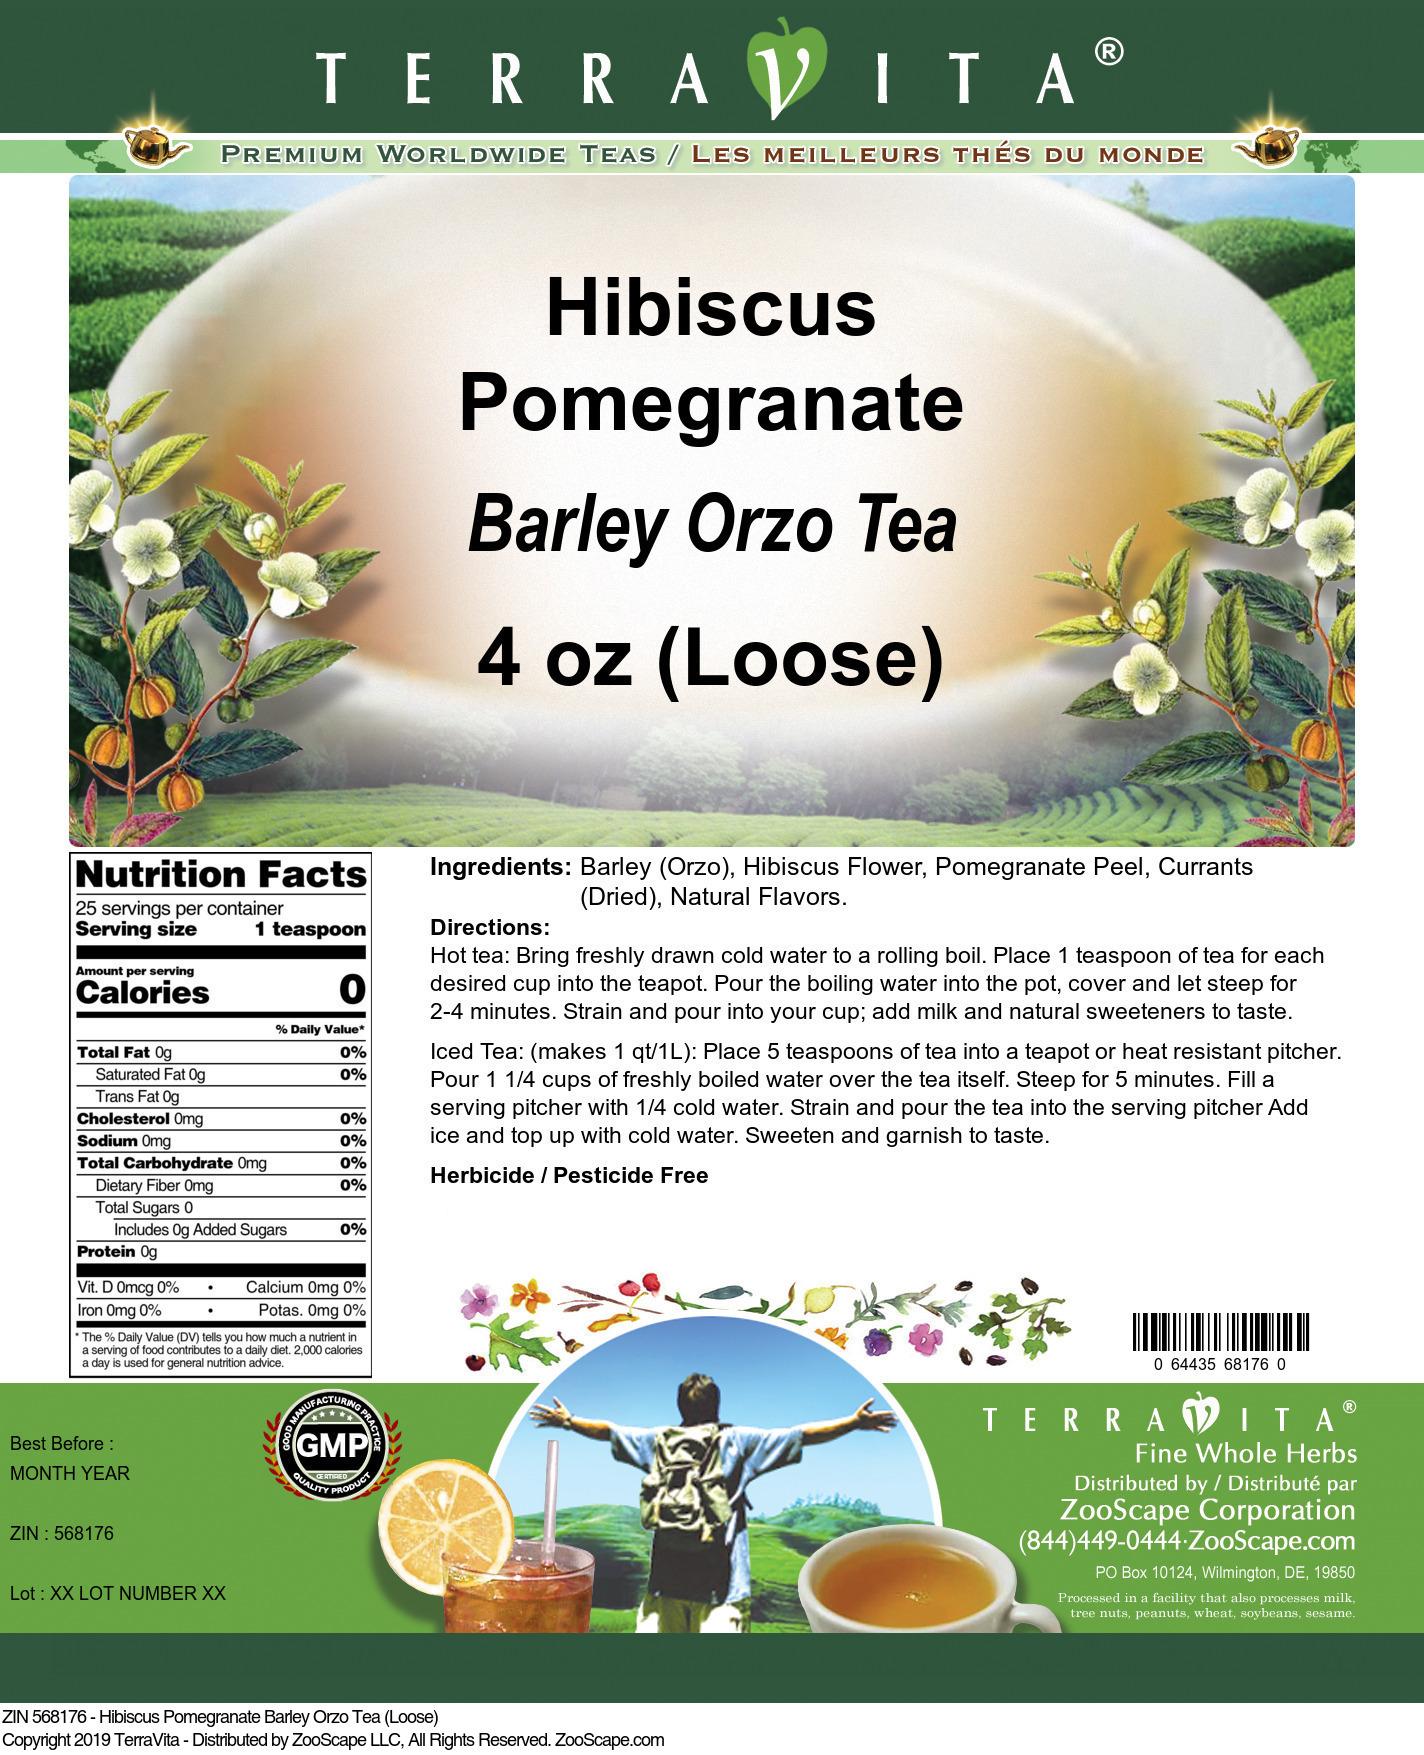 Hibiscus Pomegranate Barley Orzo